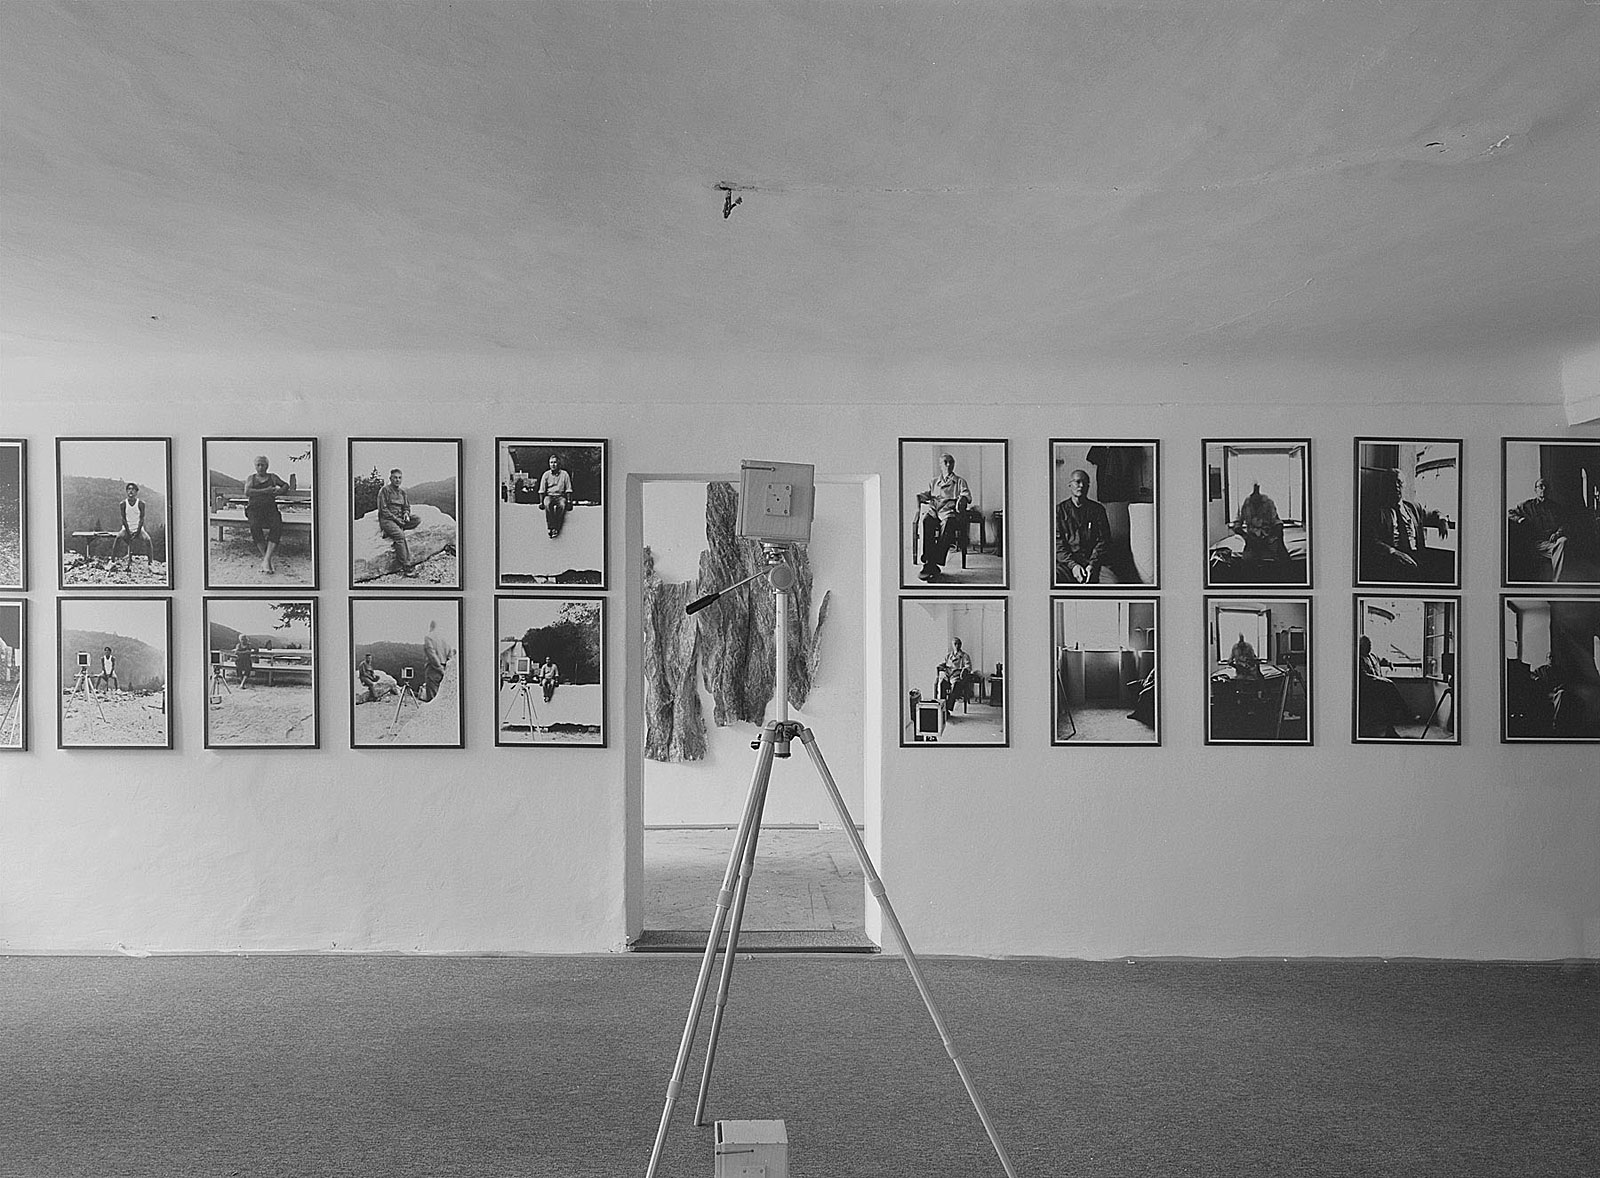 """Lochkamera-Portraits"", Hubert Maier & Michael Wesely Firmian-Salm-Haus, Salzburg"